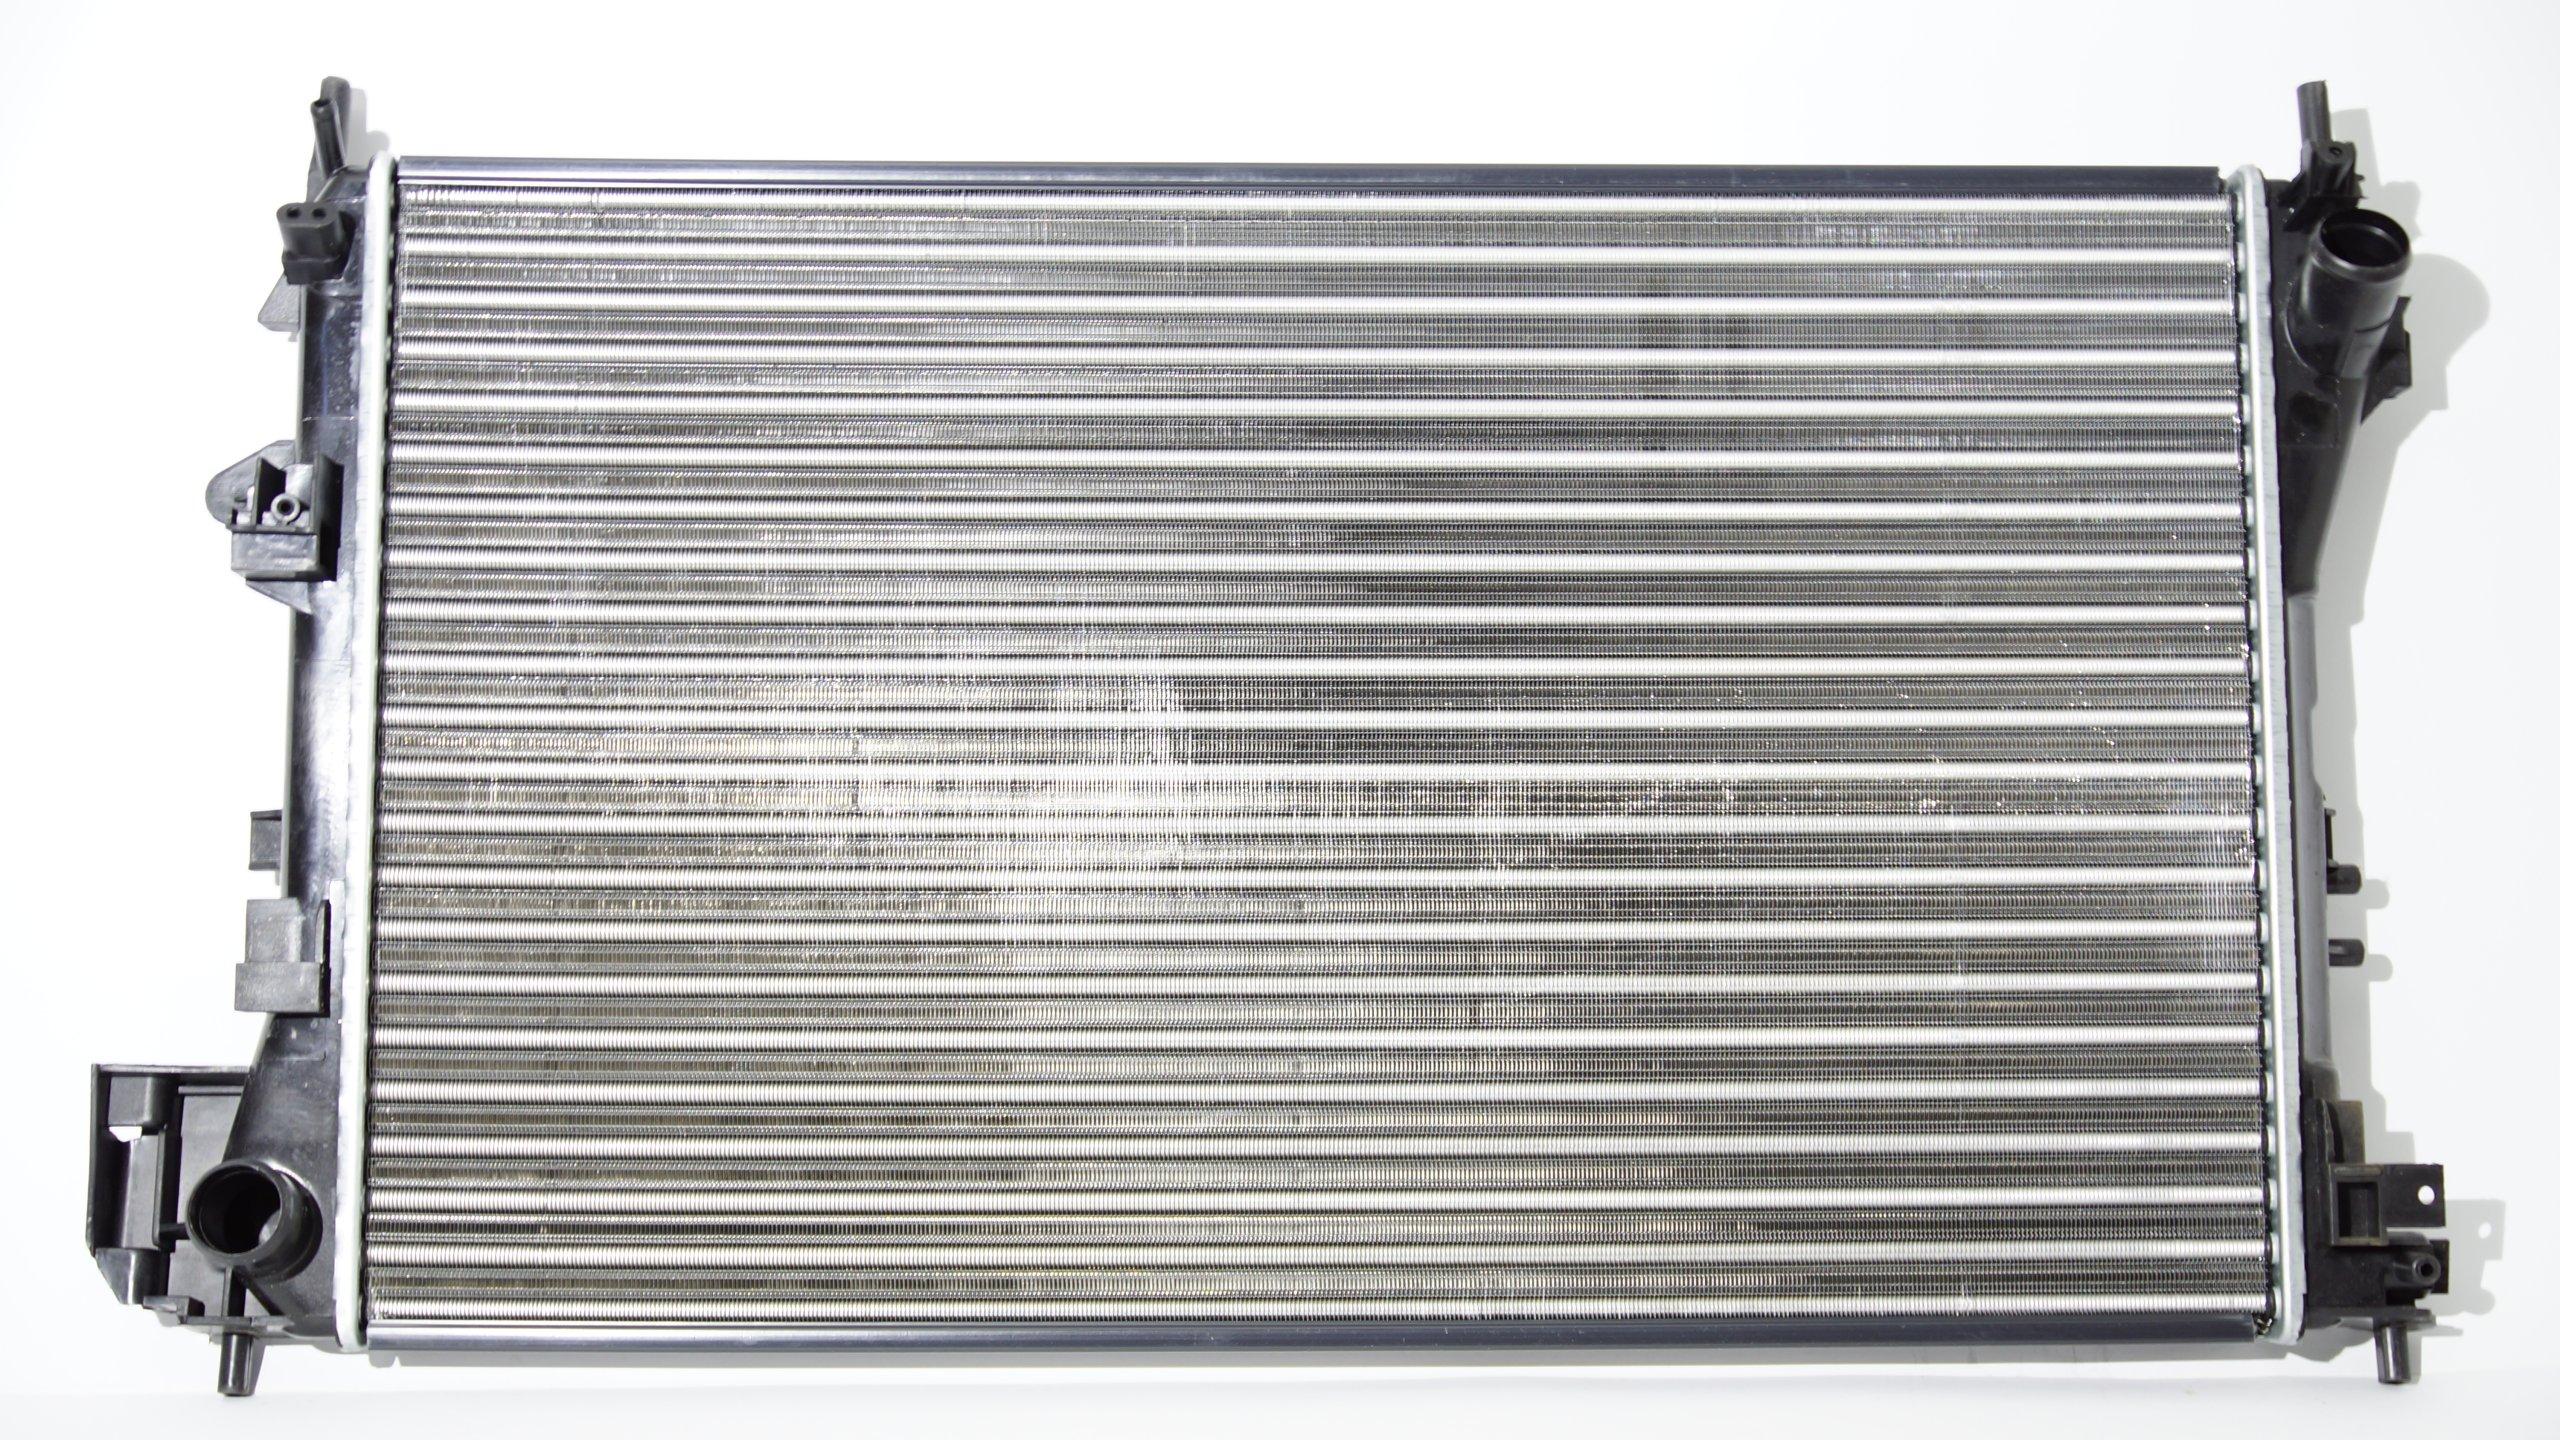 радиатор воды opel vectra c 16 18 20 22 32